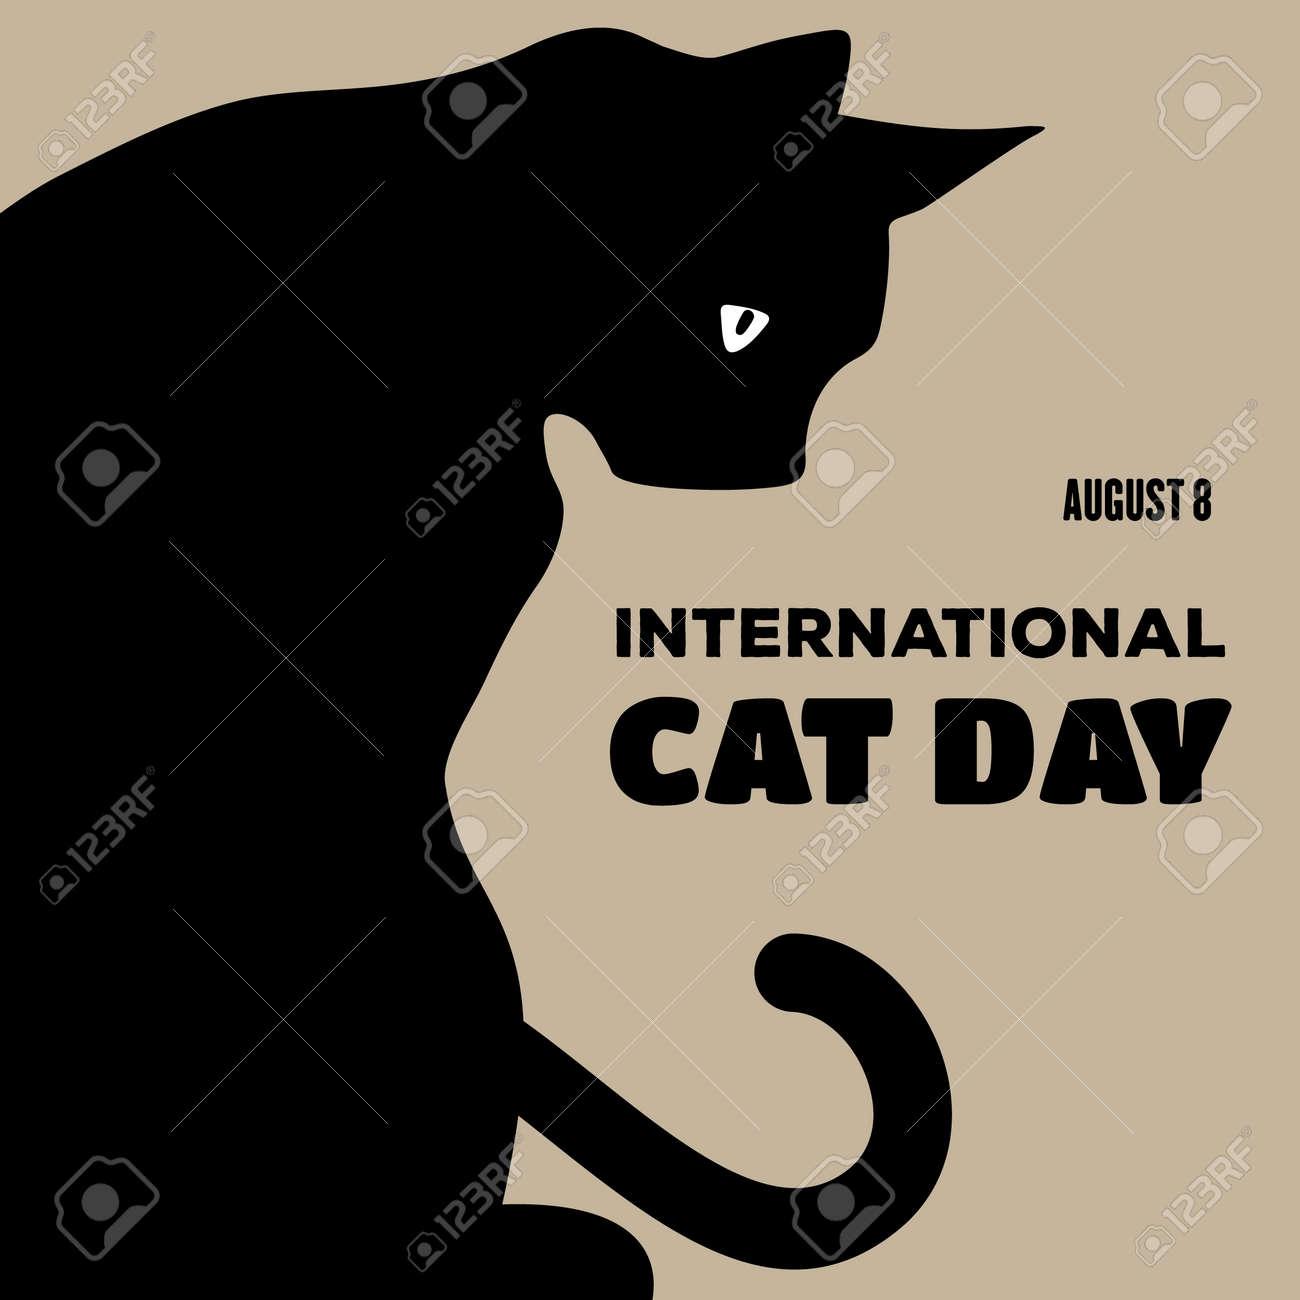 International Cat Day poster or banner design. - 171746955